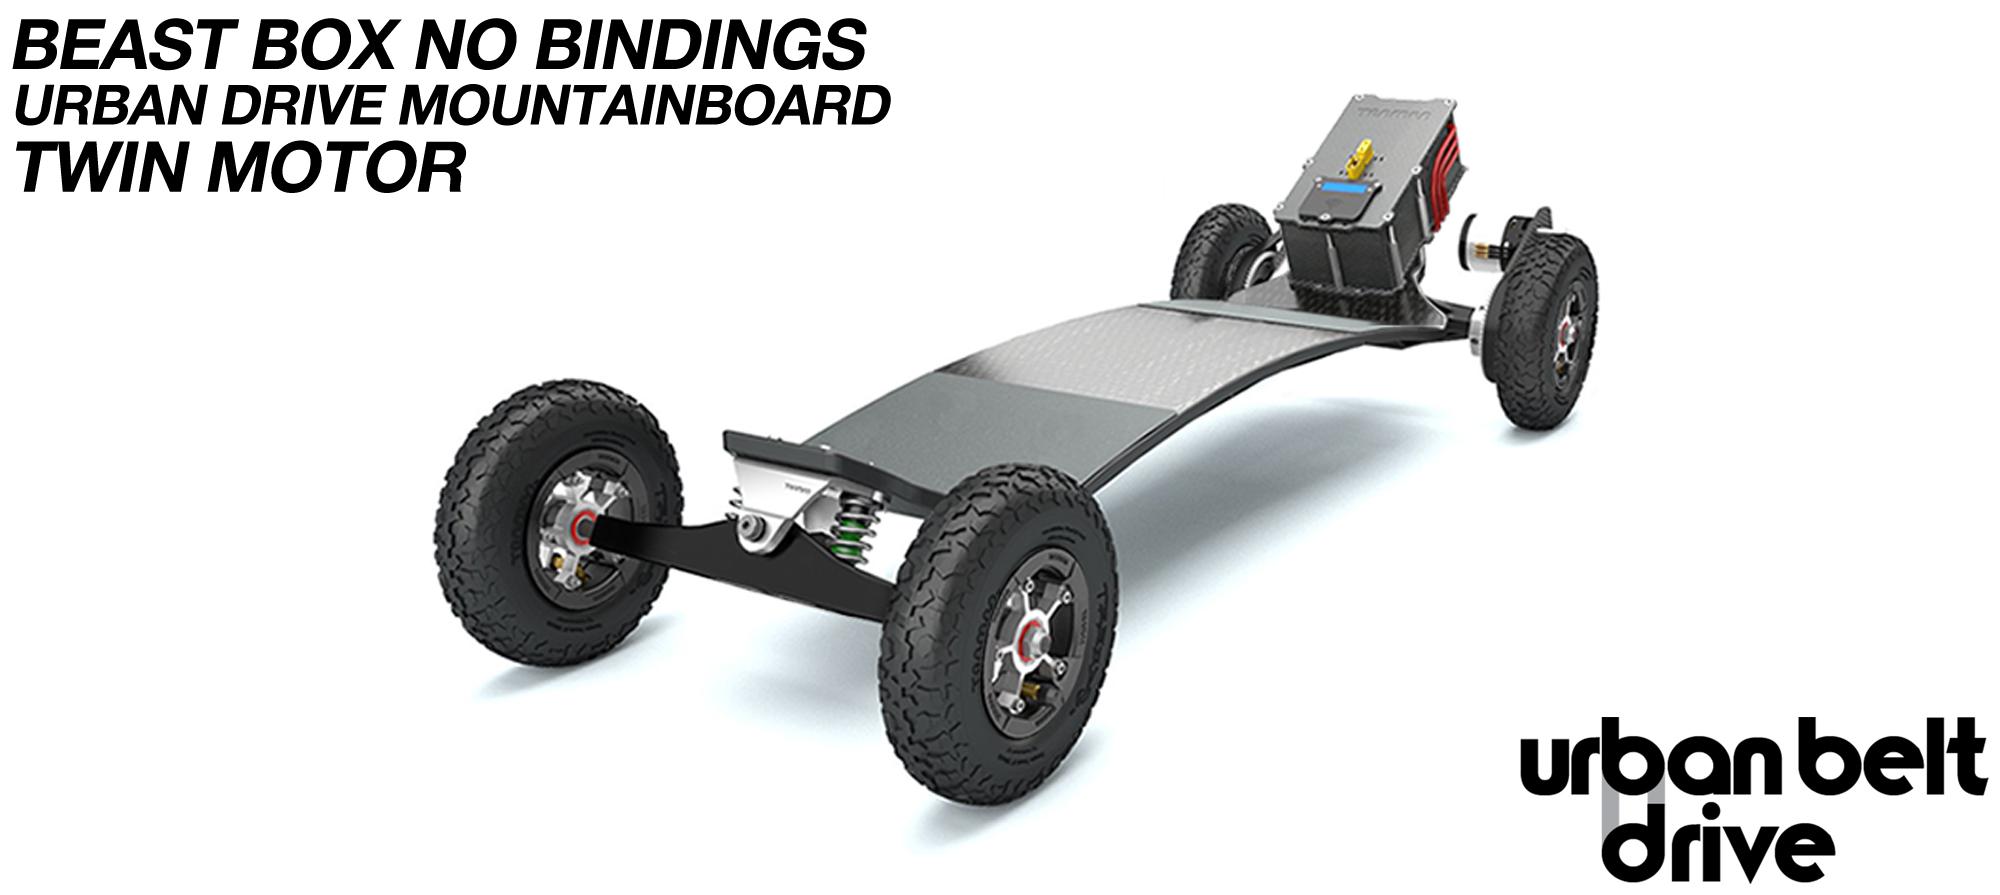 URBAN Electric Mountainboard - Urban Motor Mounts on custom TRAMPA deck ATB Trucks custom 8 inch Wheels with BEAST Box TWIN VESC - NO BINDINGS